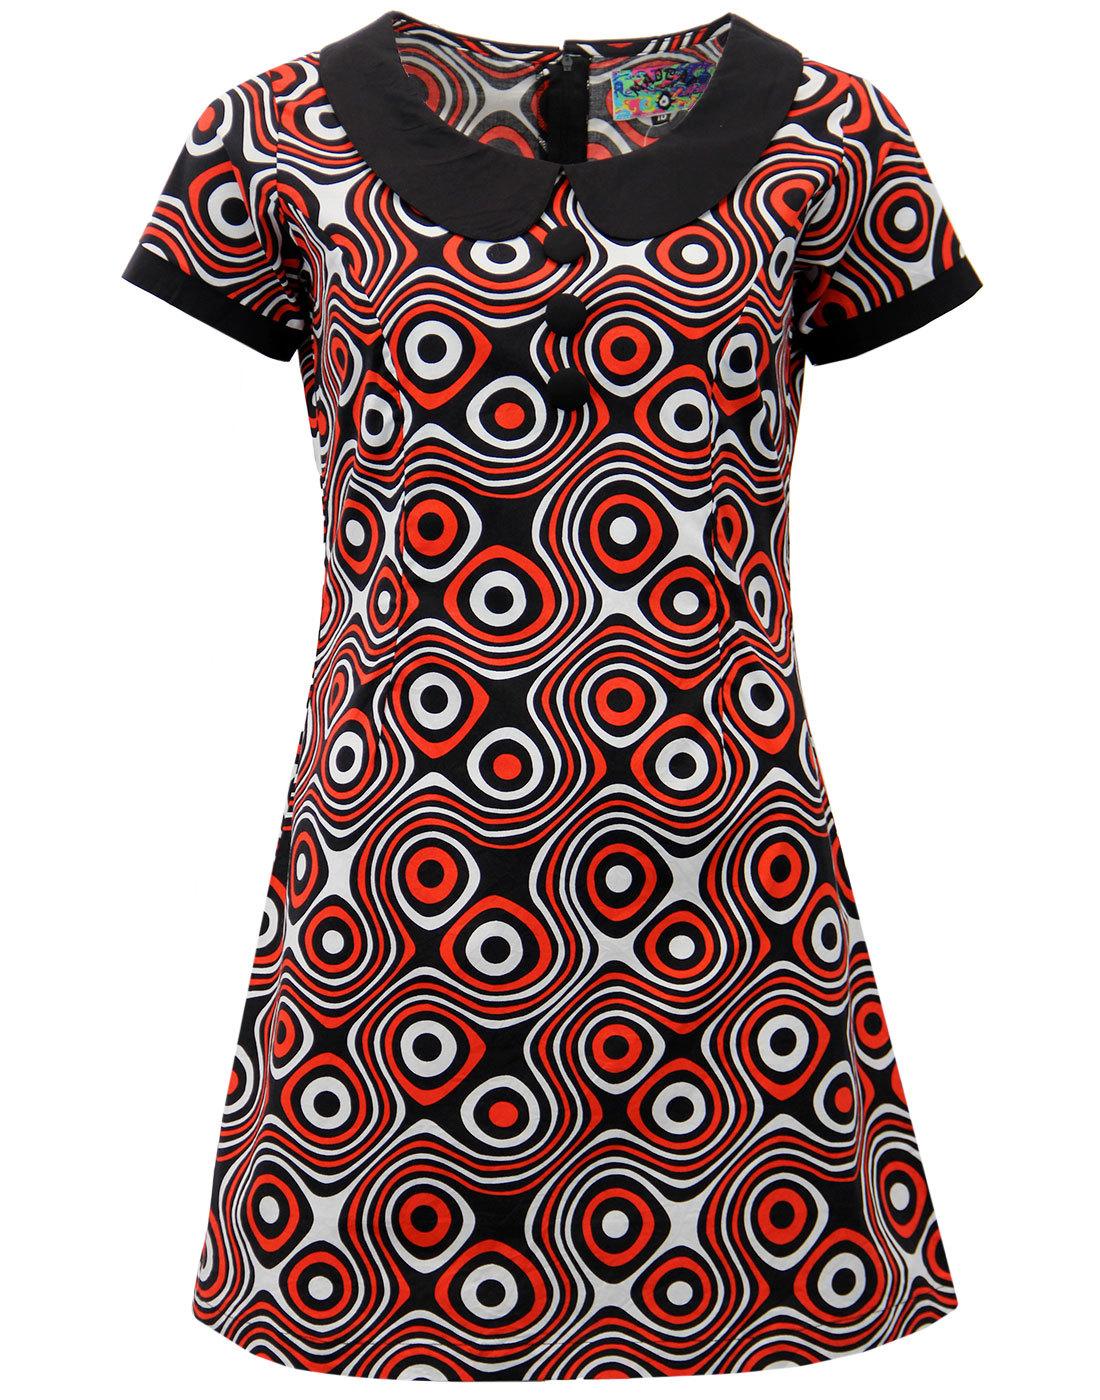 Dollierocker Op Art MADCAP ENGLAND 1960s Mod Dress